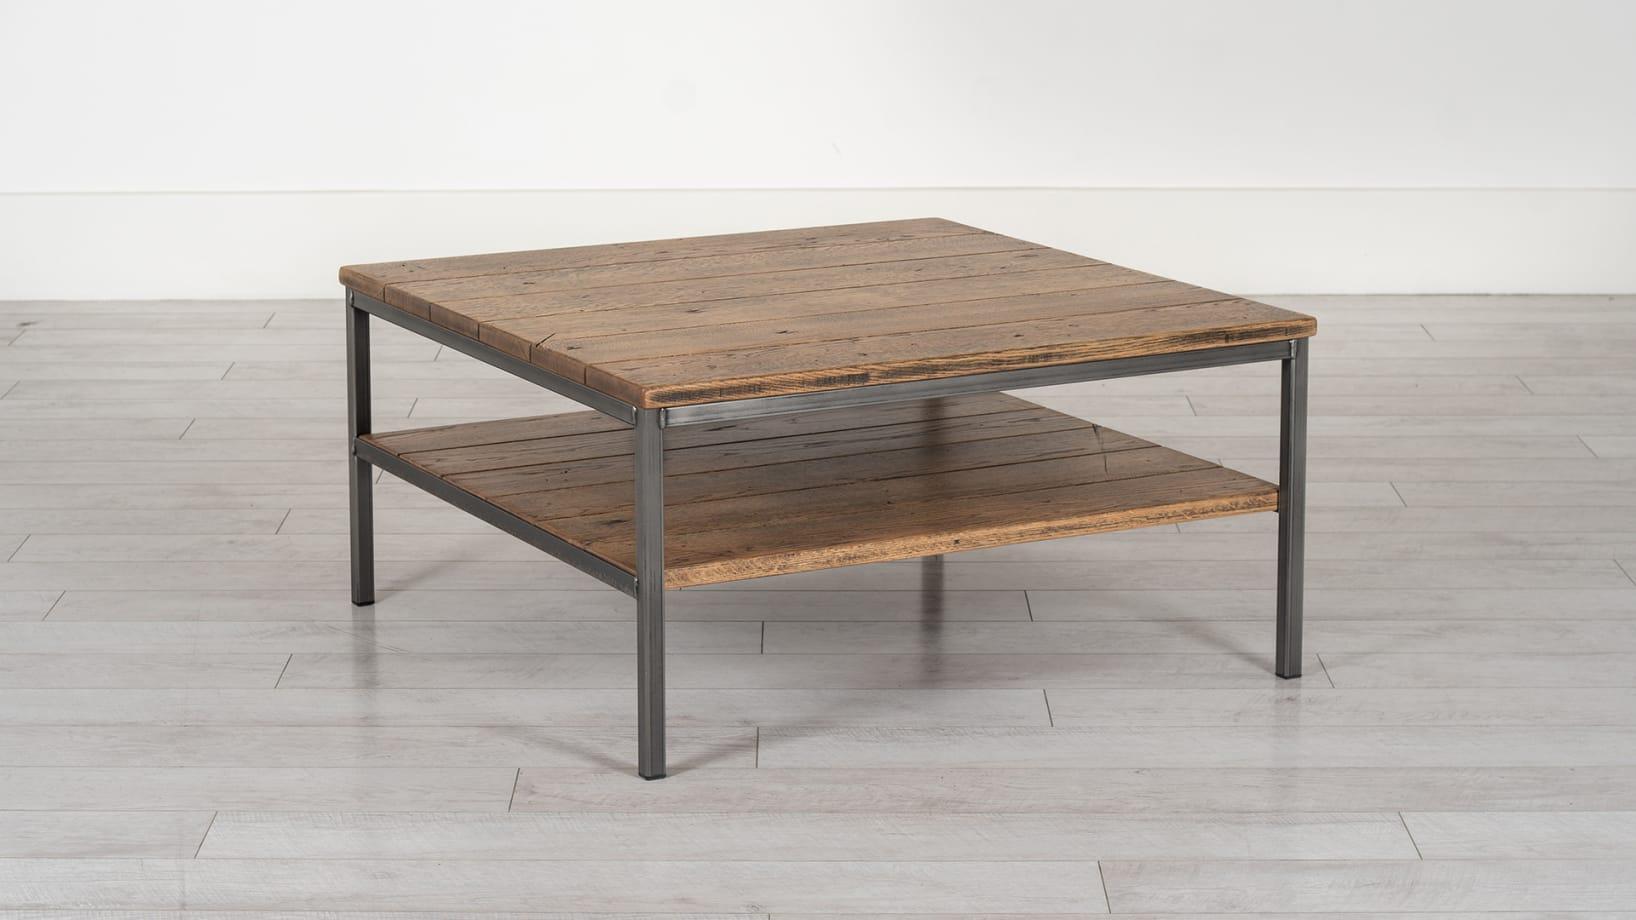 SV-WAREHOUSE-COFFEE-TABLE-001